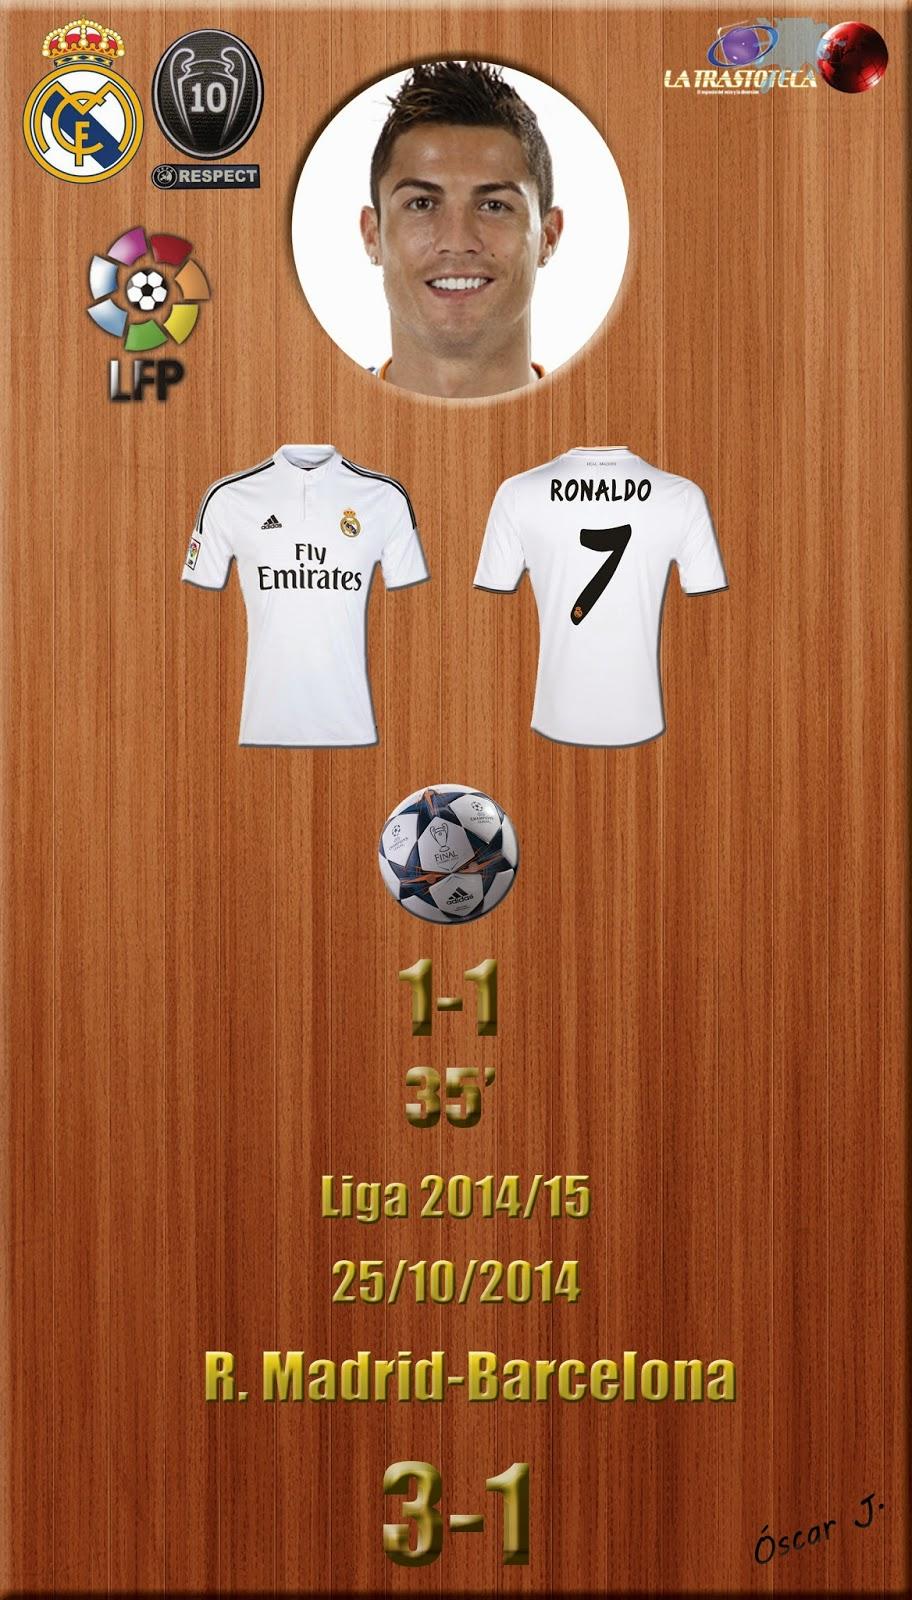 Cristiano Ronaldo - (1-1) - Real Madrid 3-1 Barcelona - Liga 2014/15 - (25/10/2014)